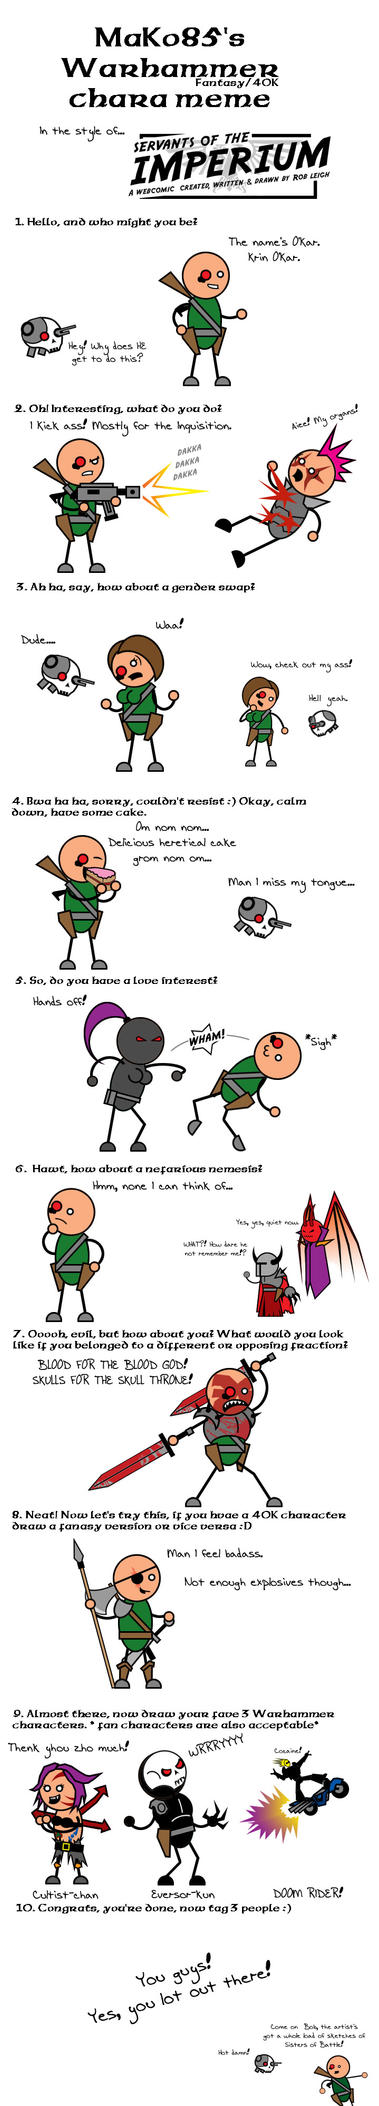 Warhammer meme by evilscary